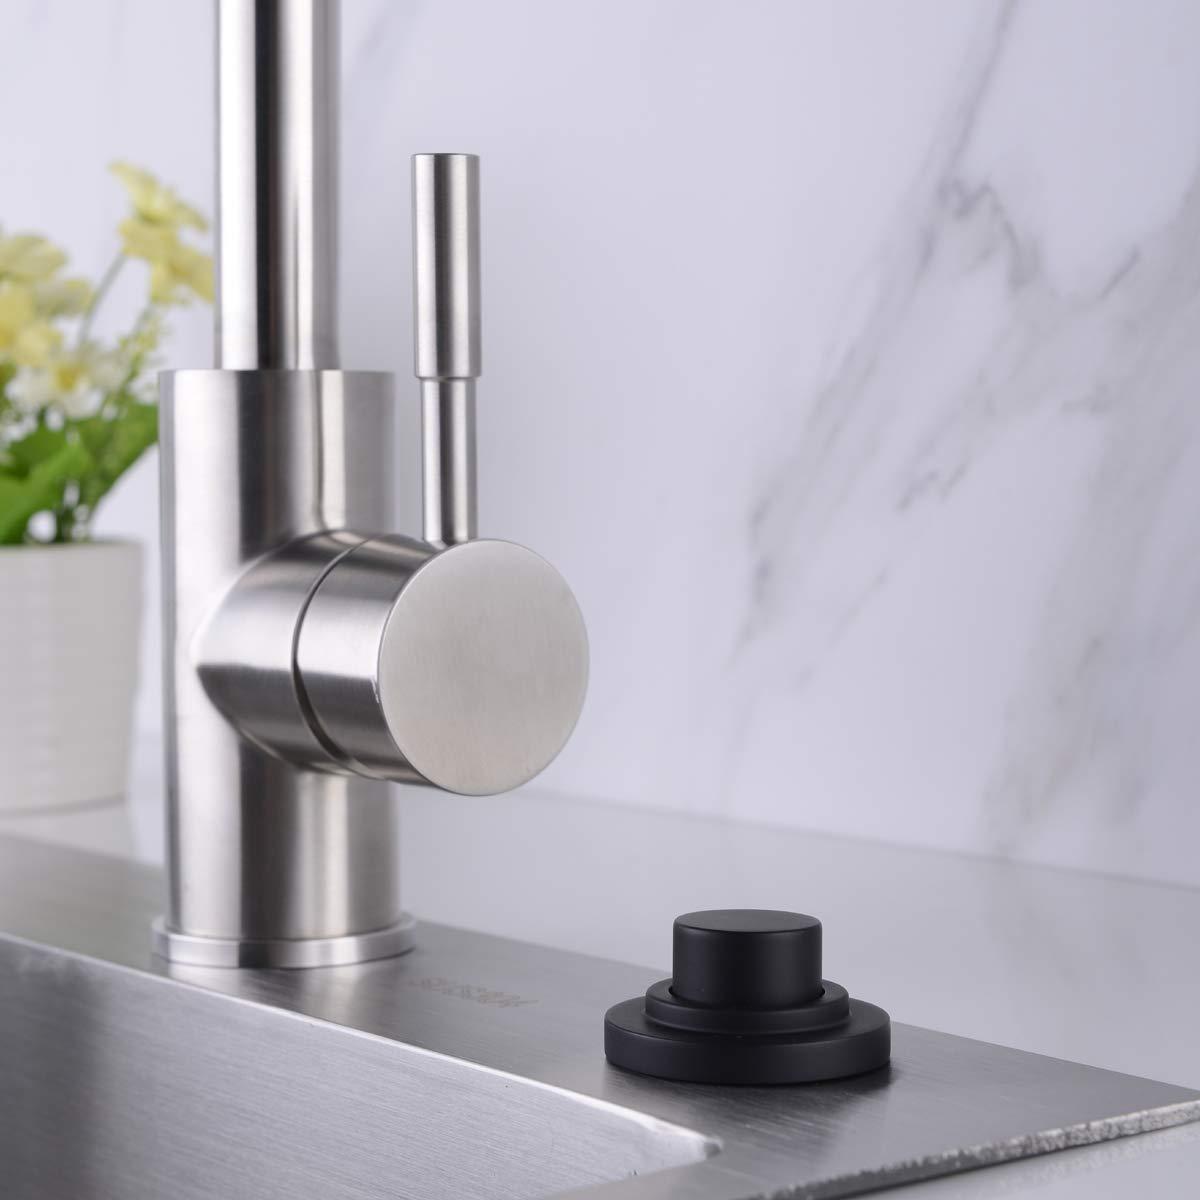 SINKINGDOM SinkTop Air Switch Kit (Full Brass) for Garbage Disposal, Cordless (Matte Black) by SINKINGDOM (Image #6)